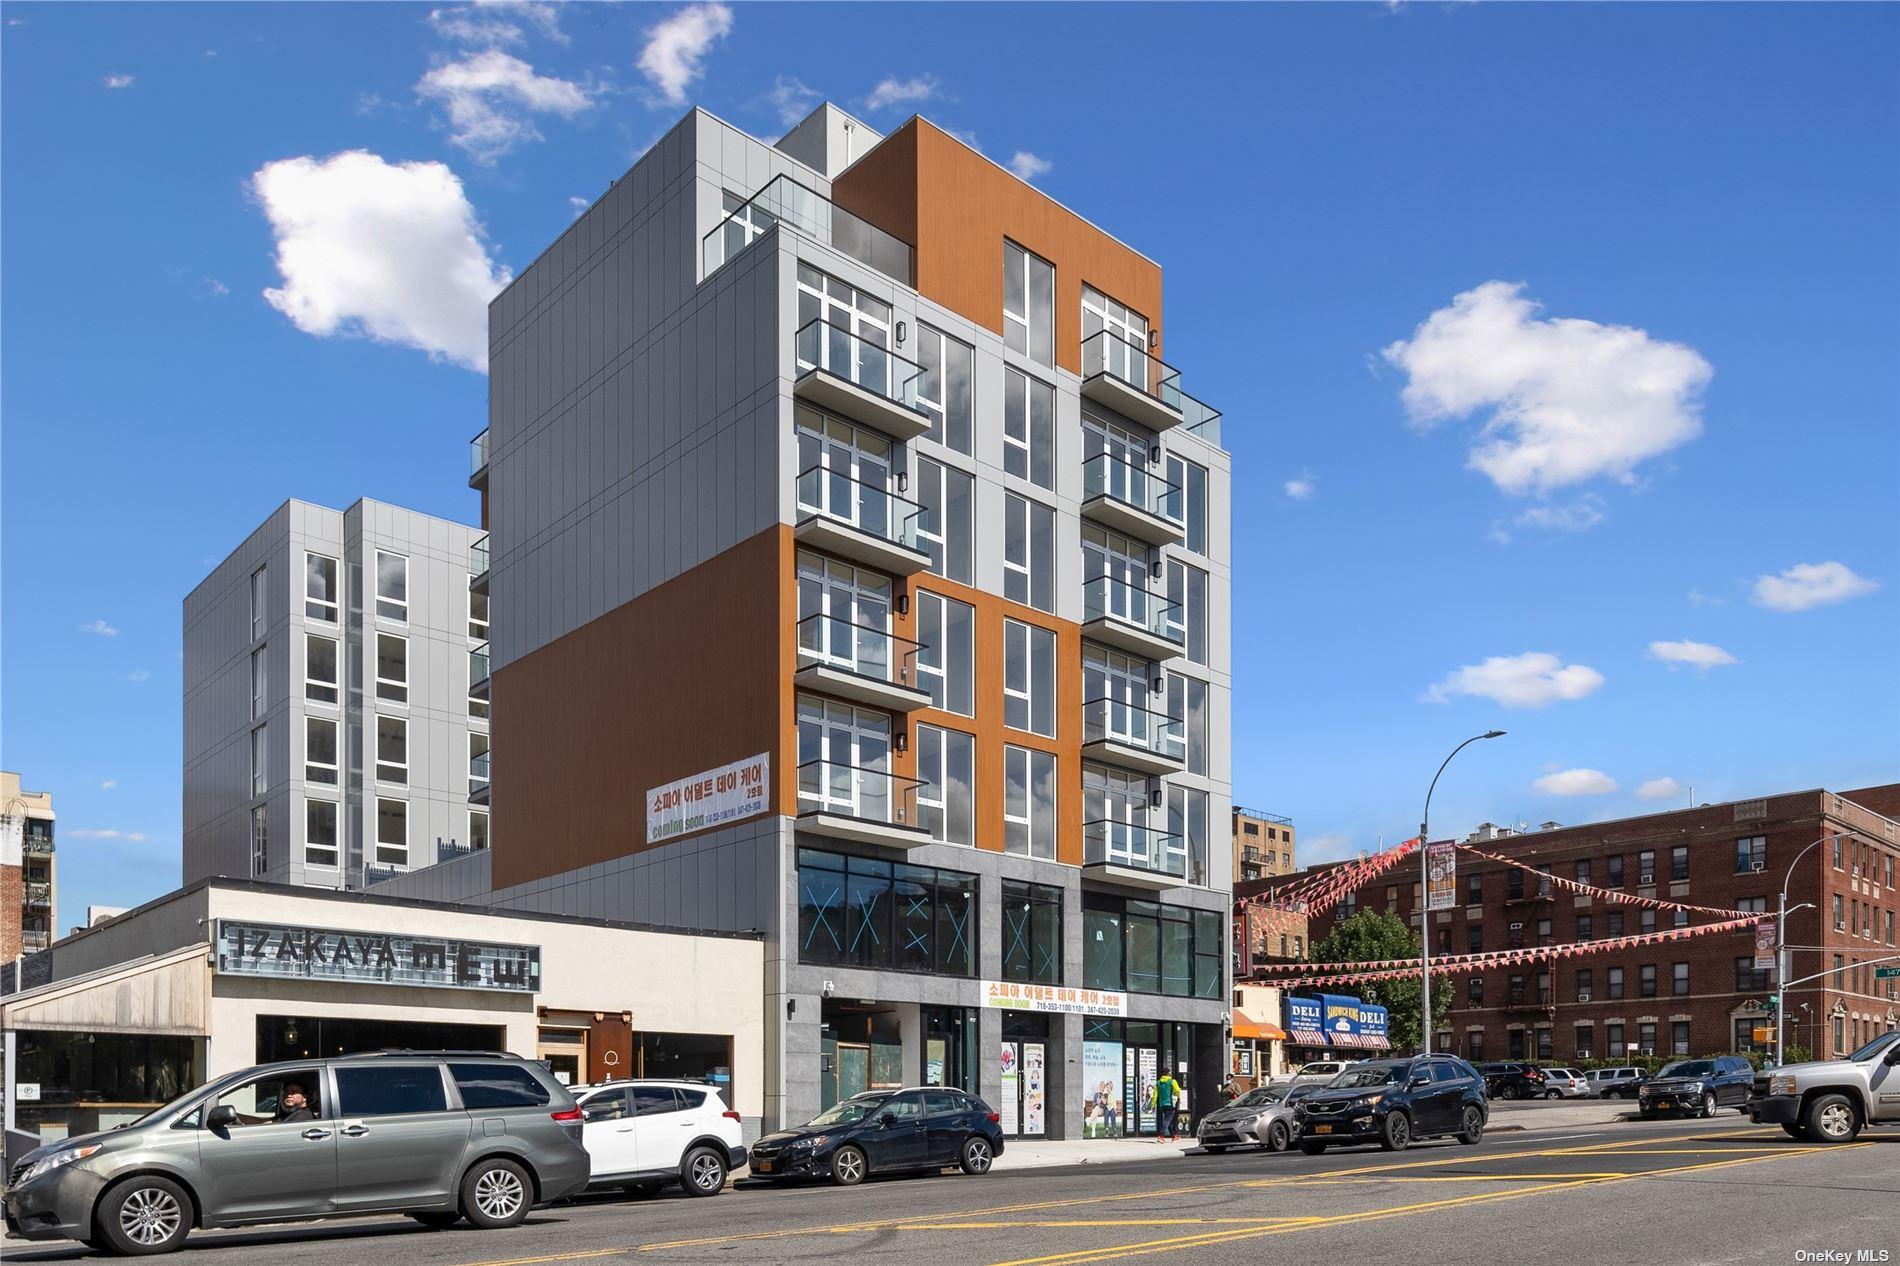 146-17 Northern Boulevard, Flushing, New York11354 | Residential For Sale